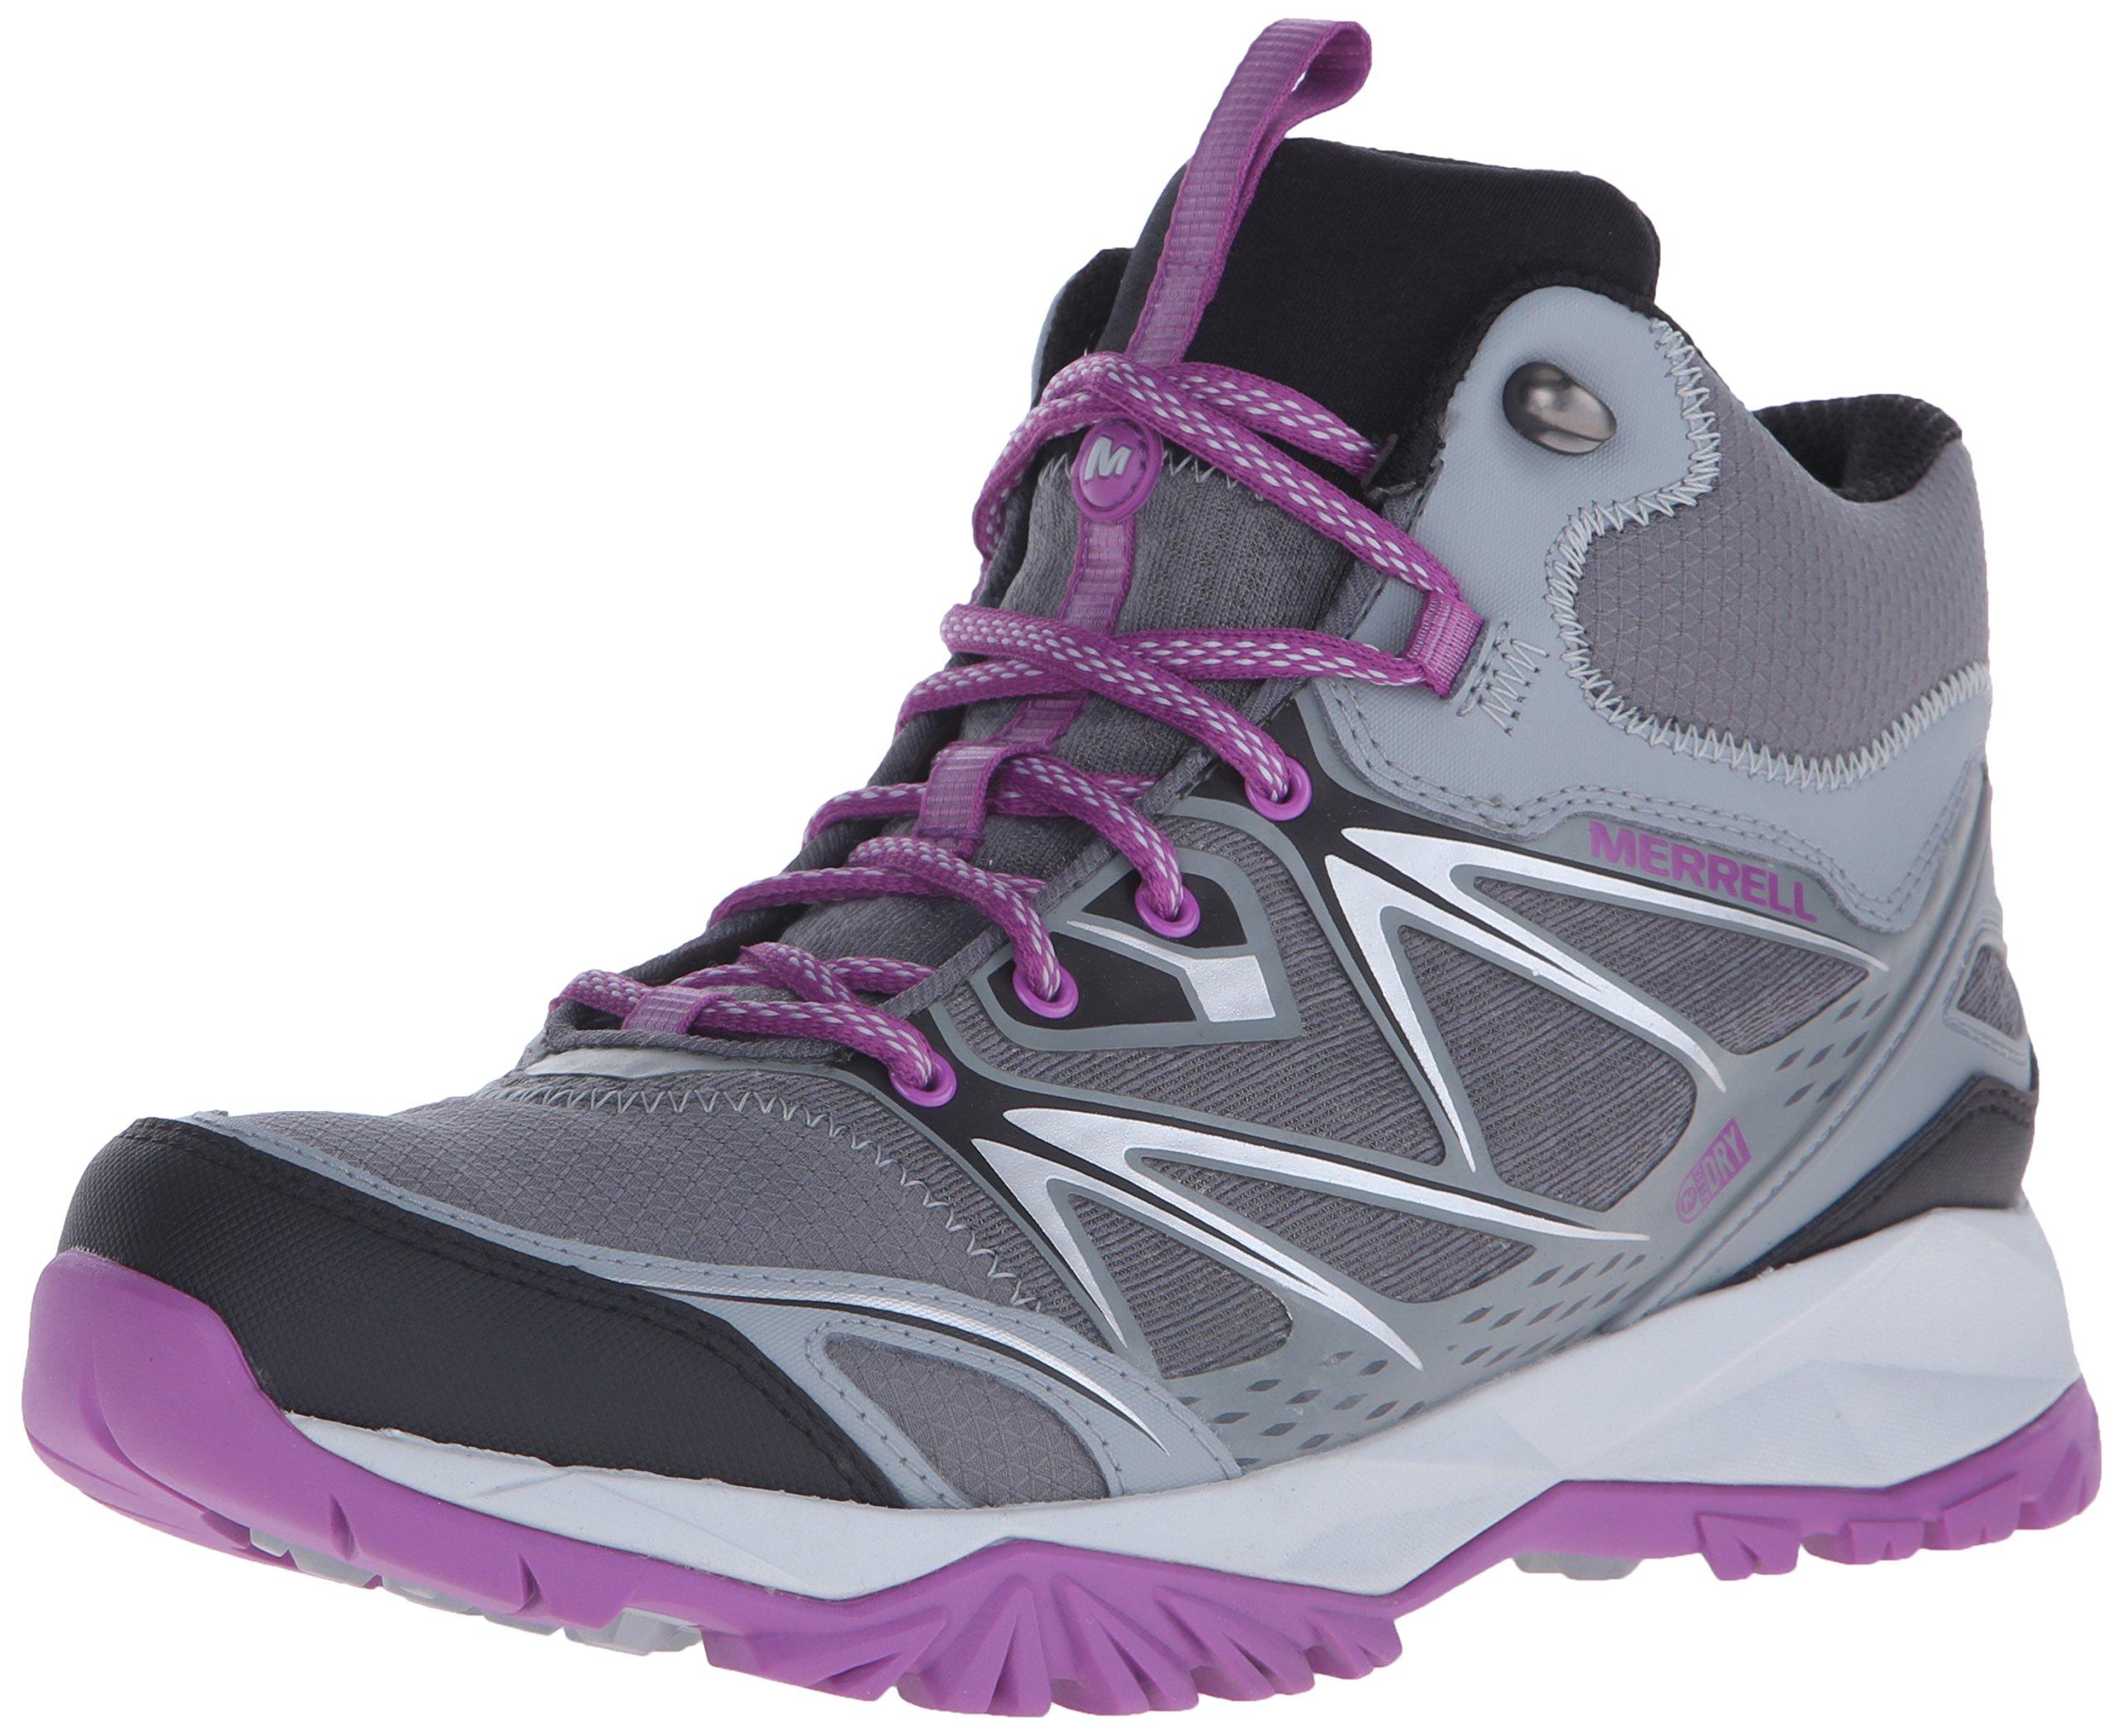 Merrell Women's Capra Bolt Mid Waterproof Hiking Boot, Grey/Purple, 9 M US